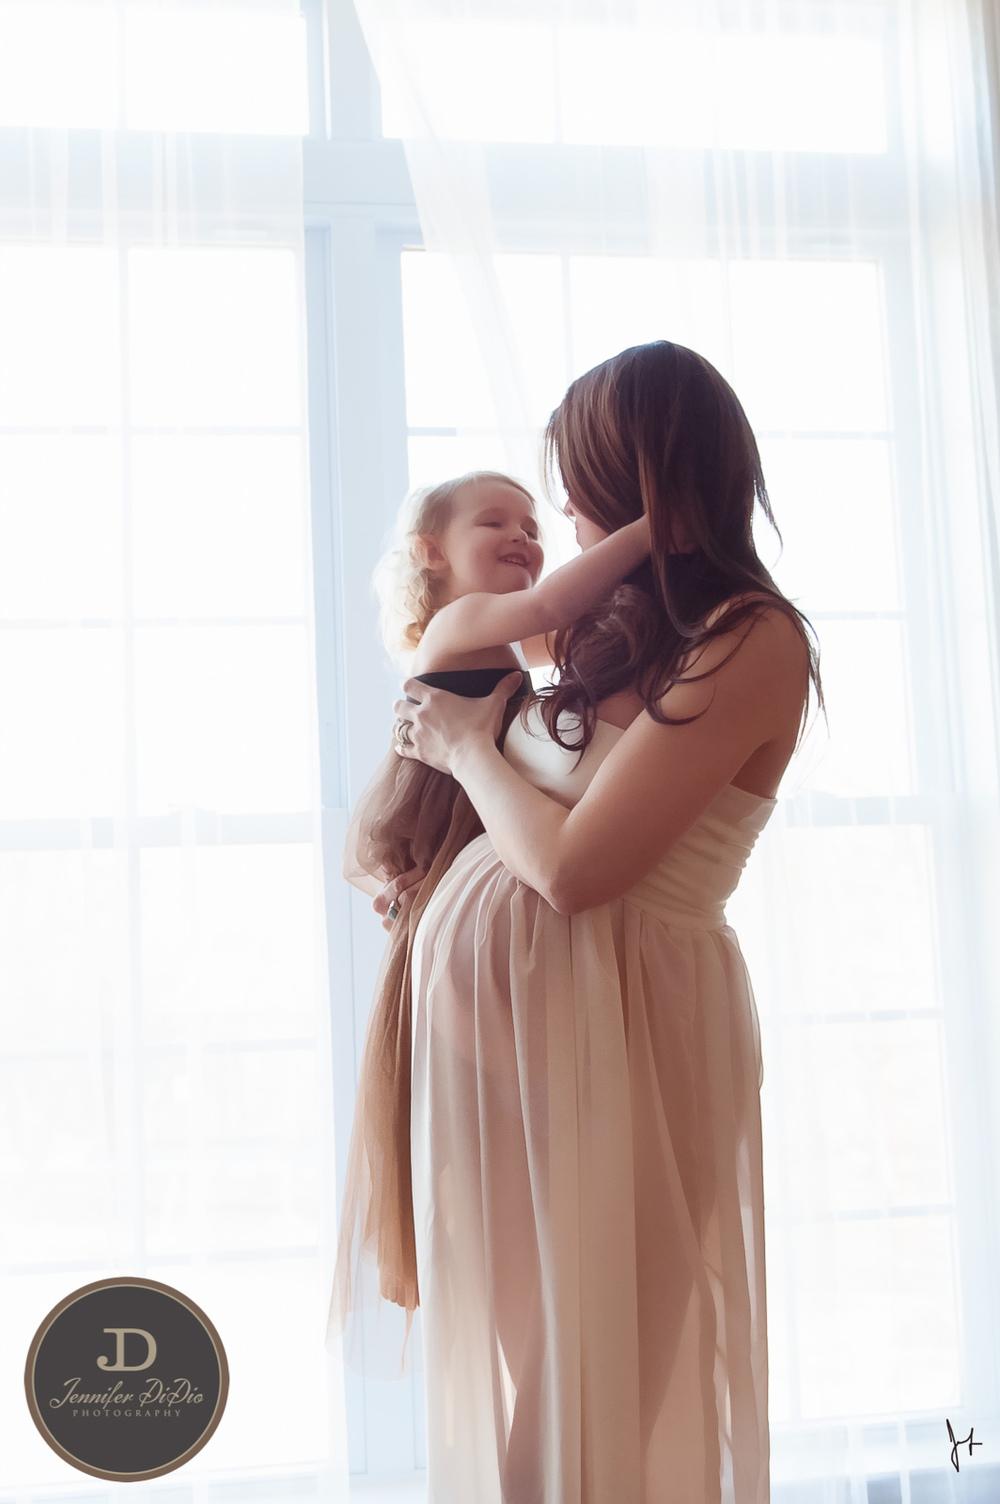 Jennifer.DiDio.Photography.Williams.Rebecca.Maternity.2014-346.jpg